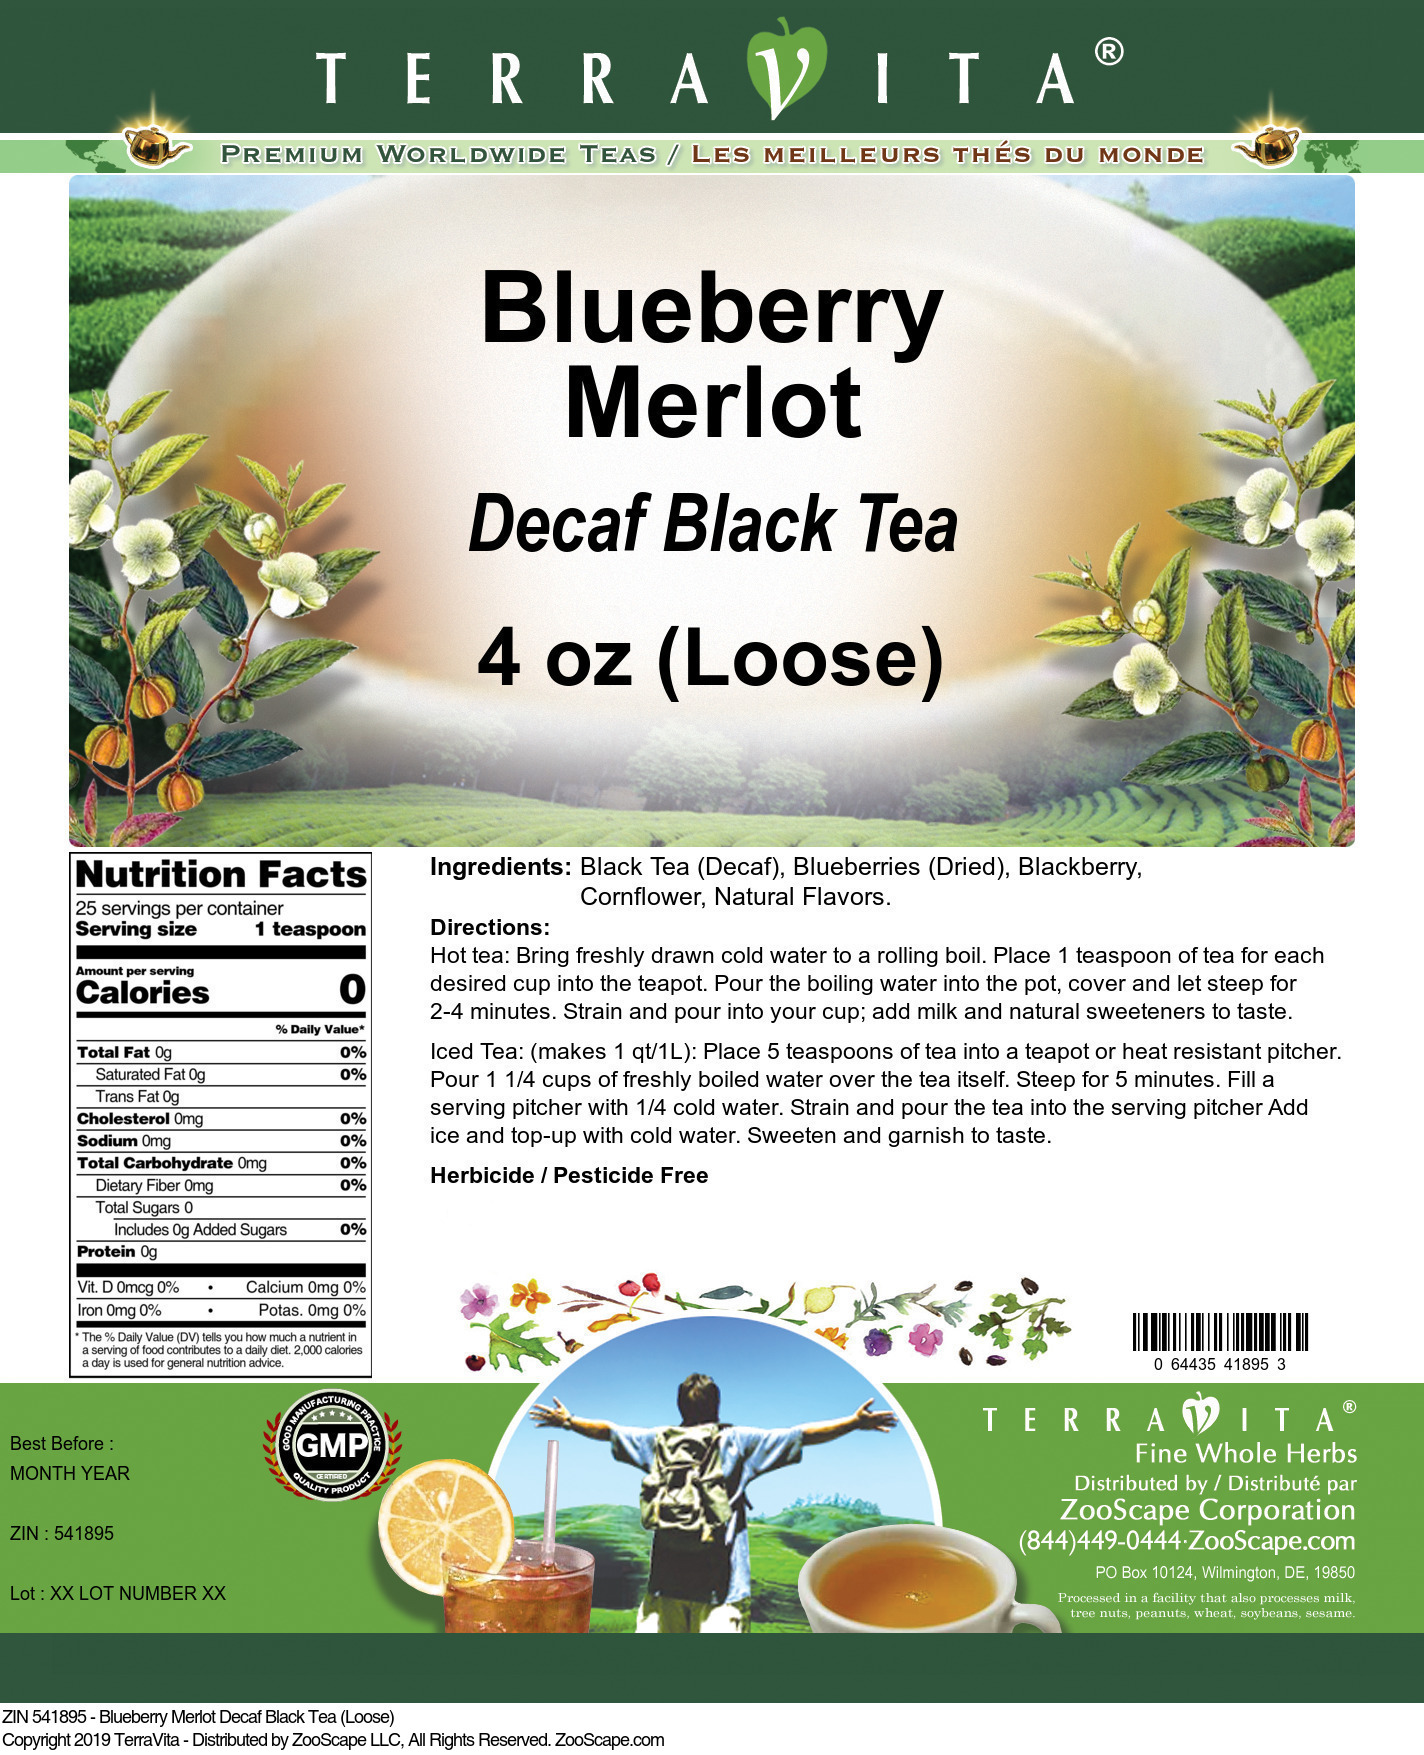 Blueberry Merlot Decaf Black Tea (Loose)